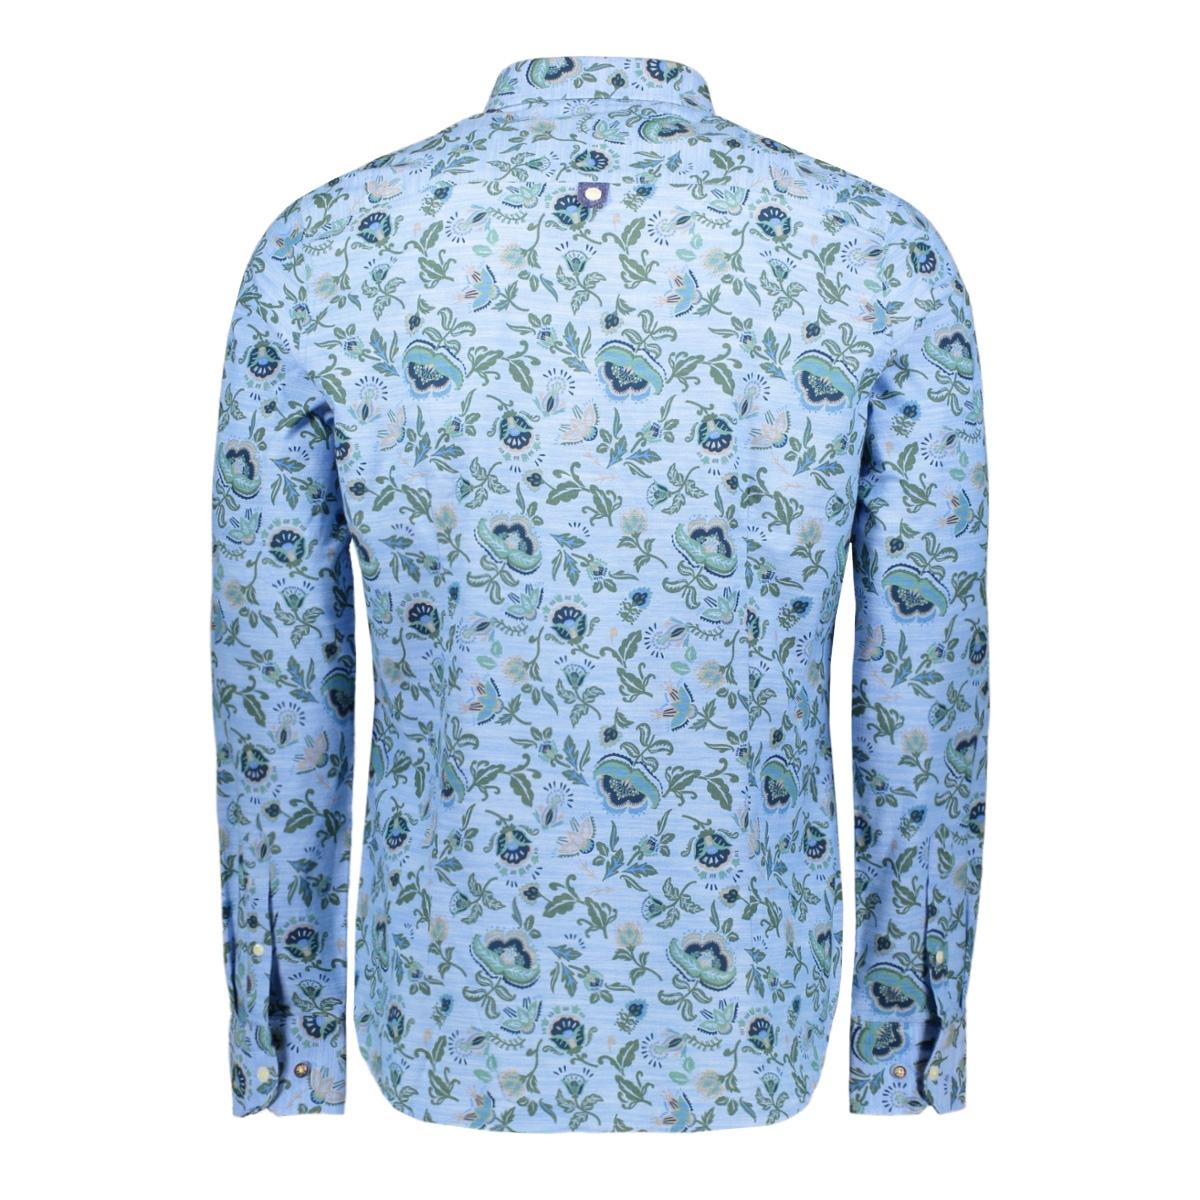 waiuku 20an559 nza overhemd 370 light blue